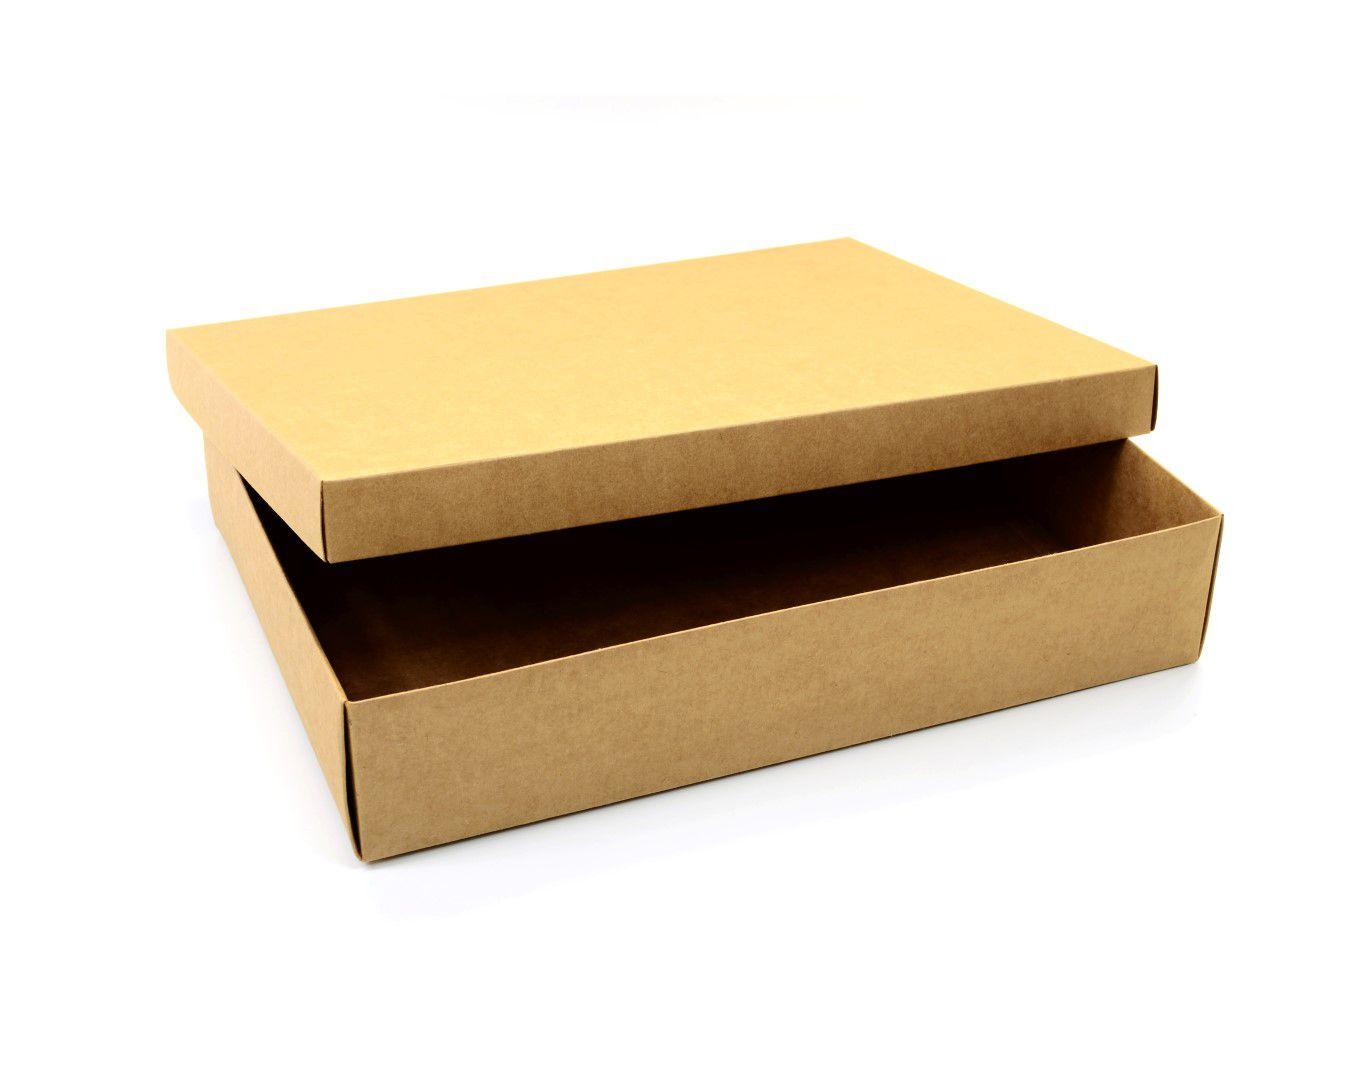 Ref 089 Kraft - Caixa c/ tampa papel - 40x29x8 cm - c/ 5 unidades